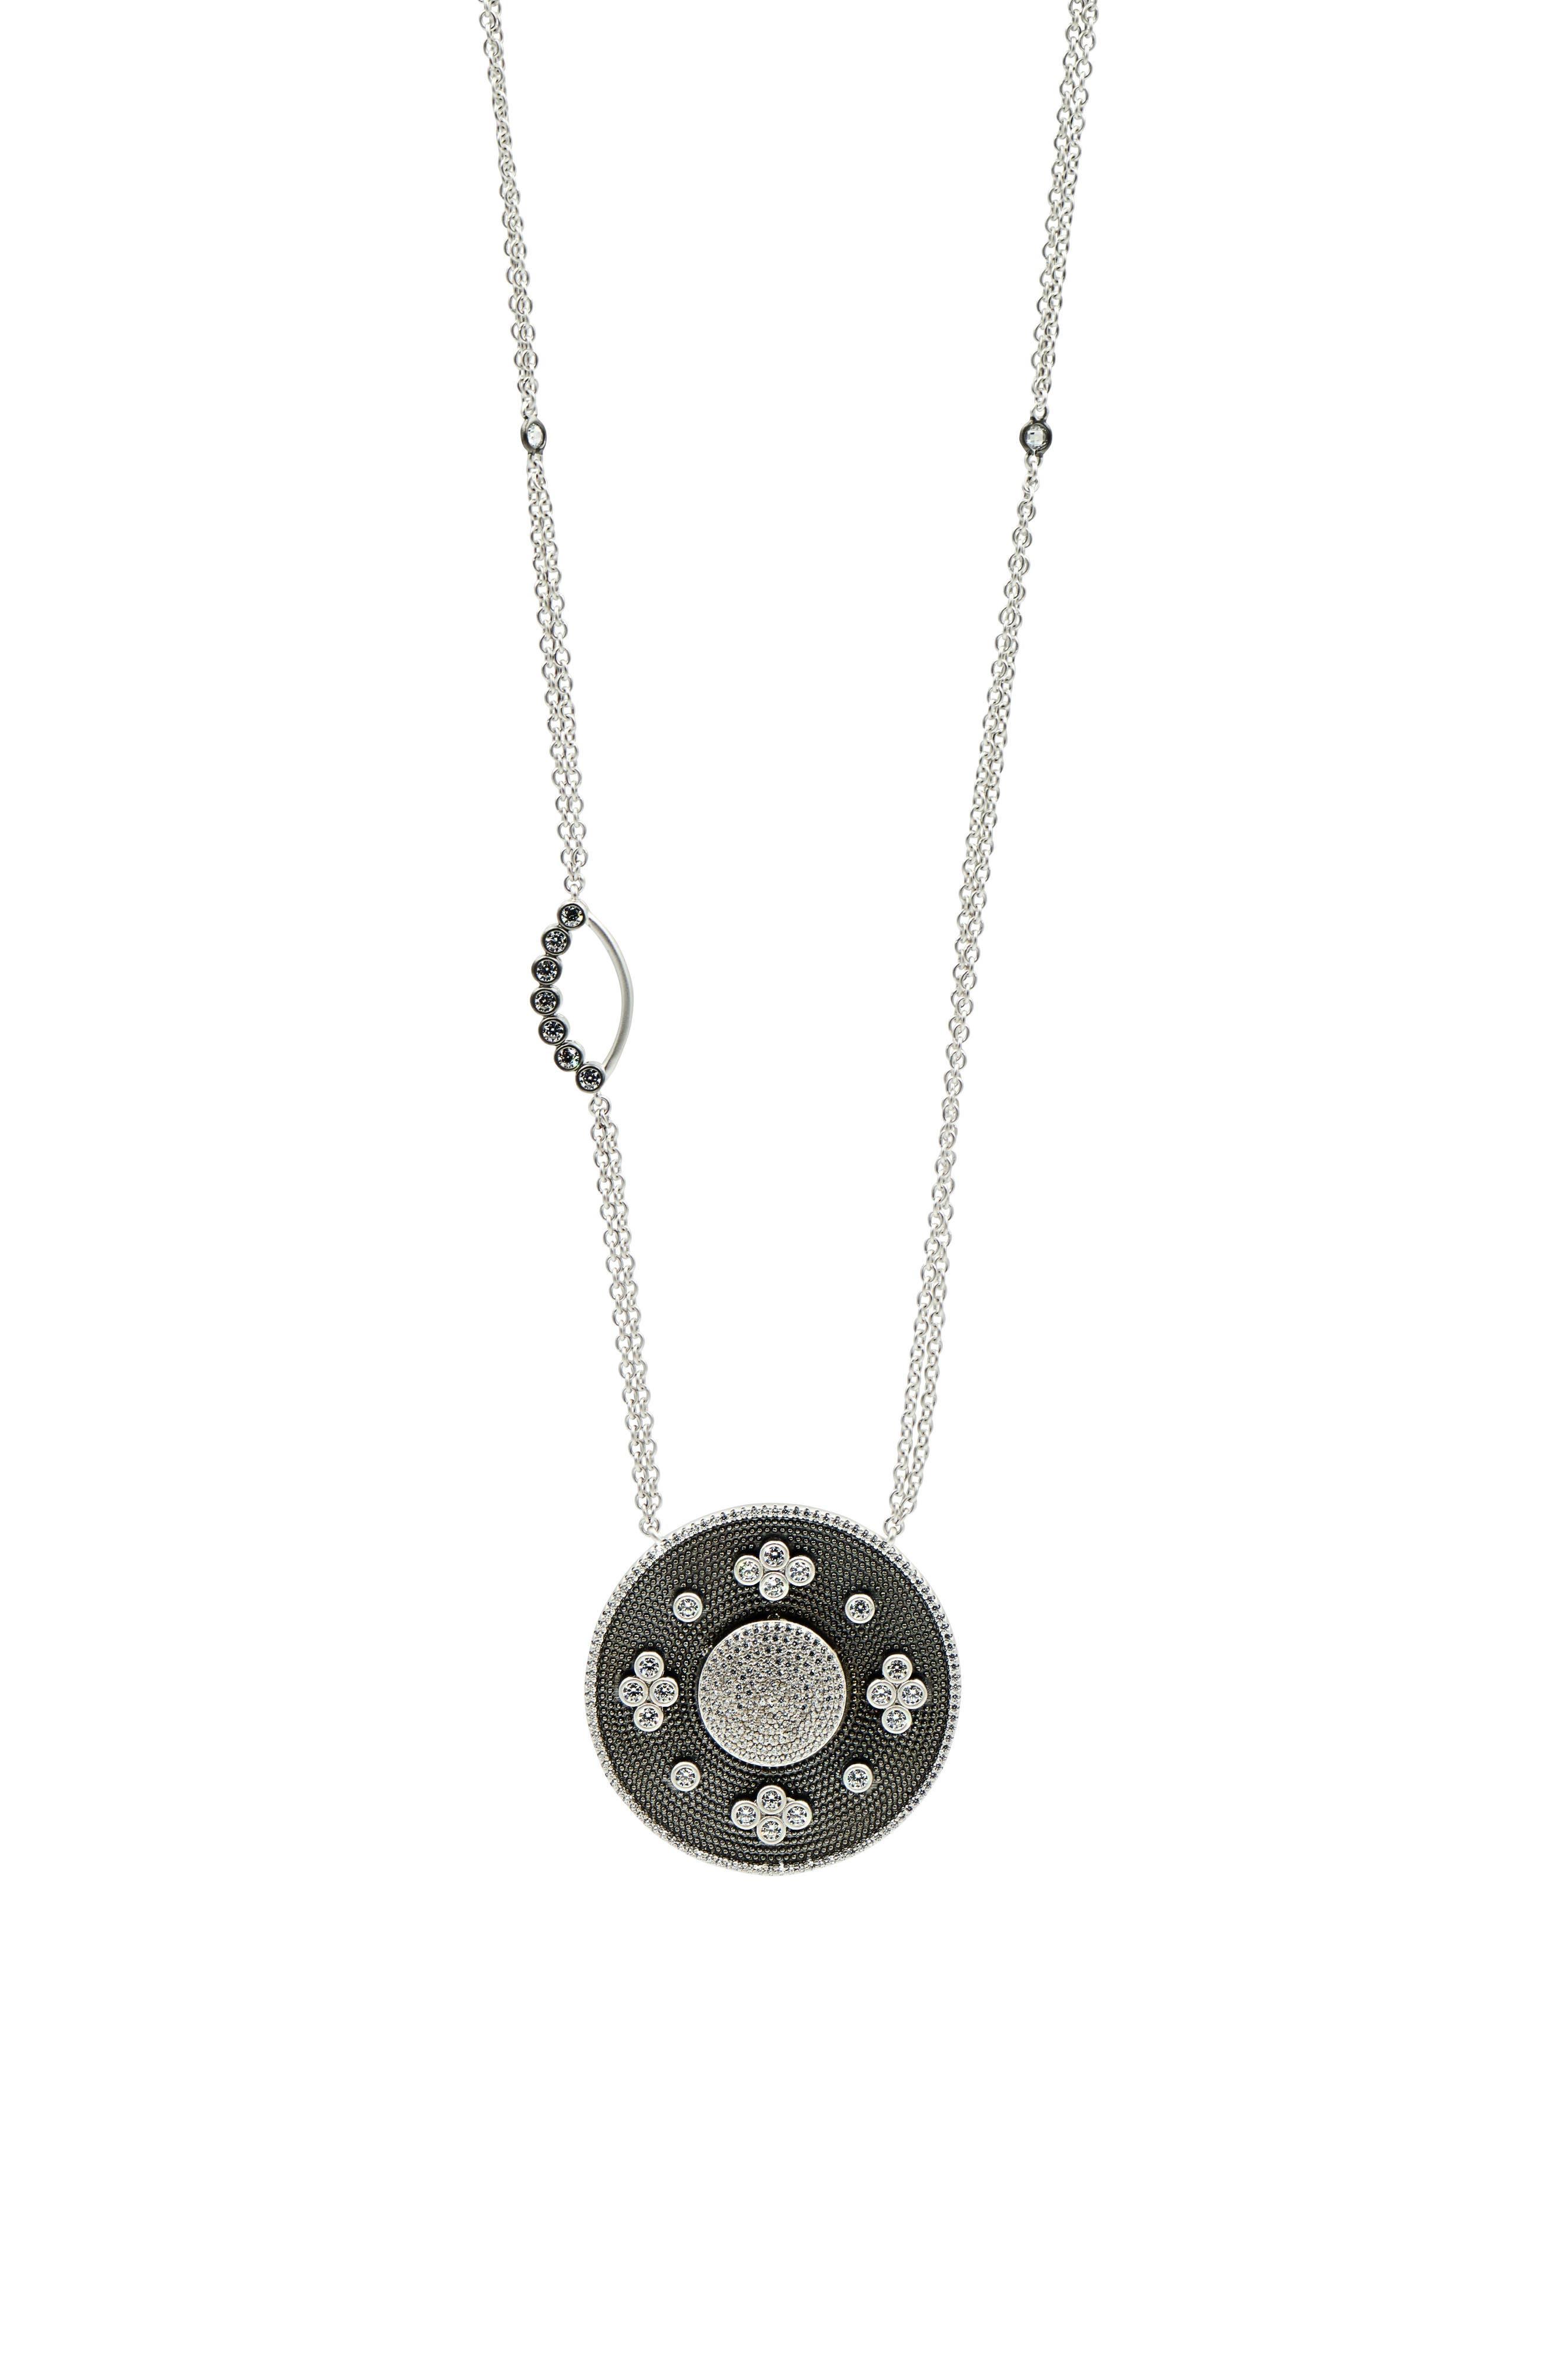 Industrial Finish Pendant Necklace,                         Main,                         color, Black/ Silver